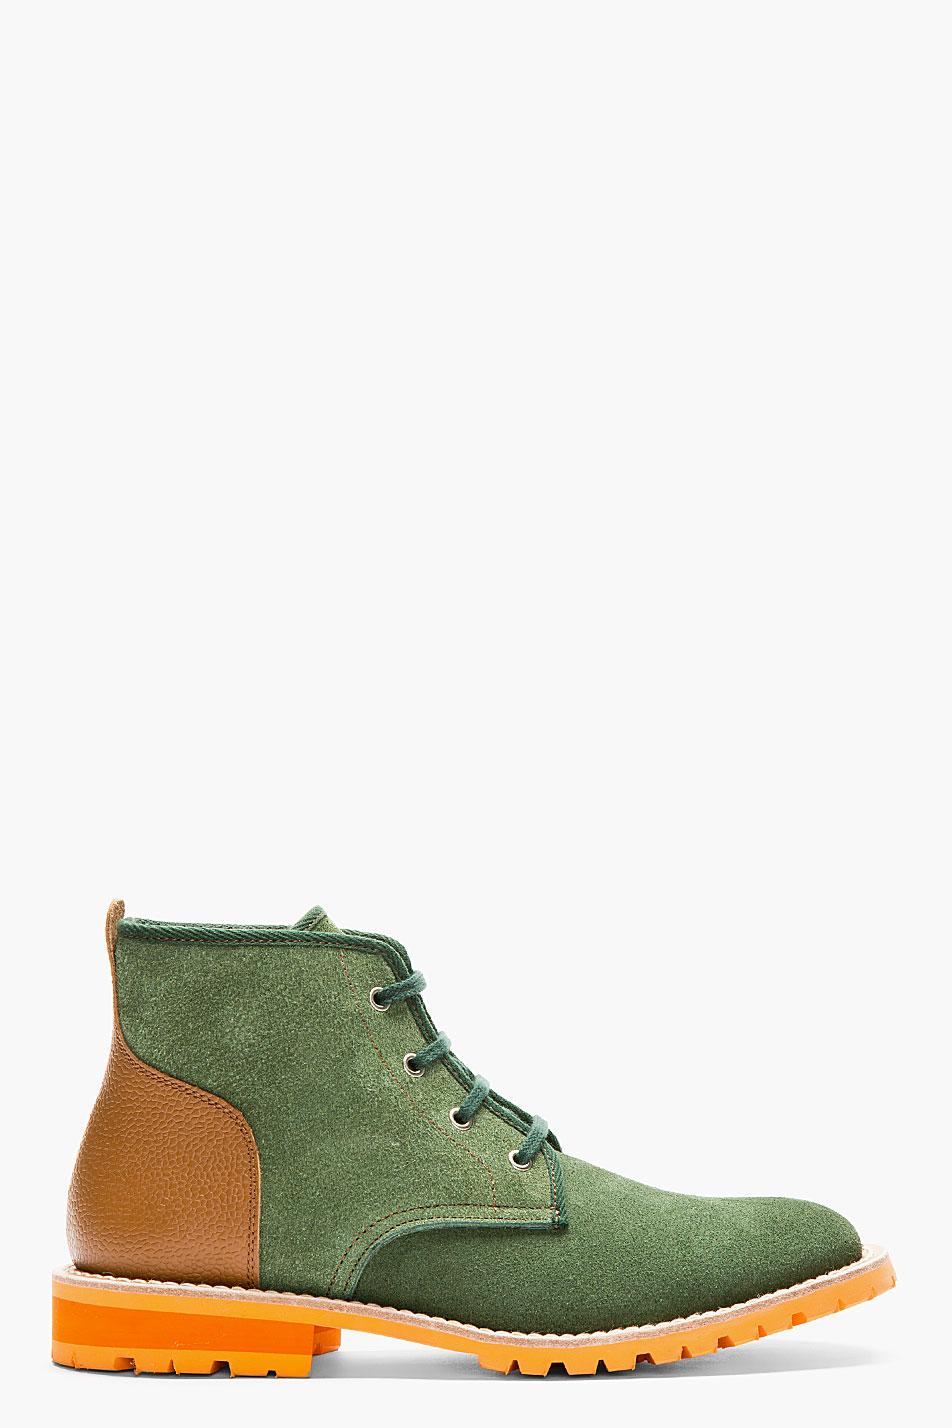 Green & Cognac Boots lace-up Junya Watanabe 1